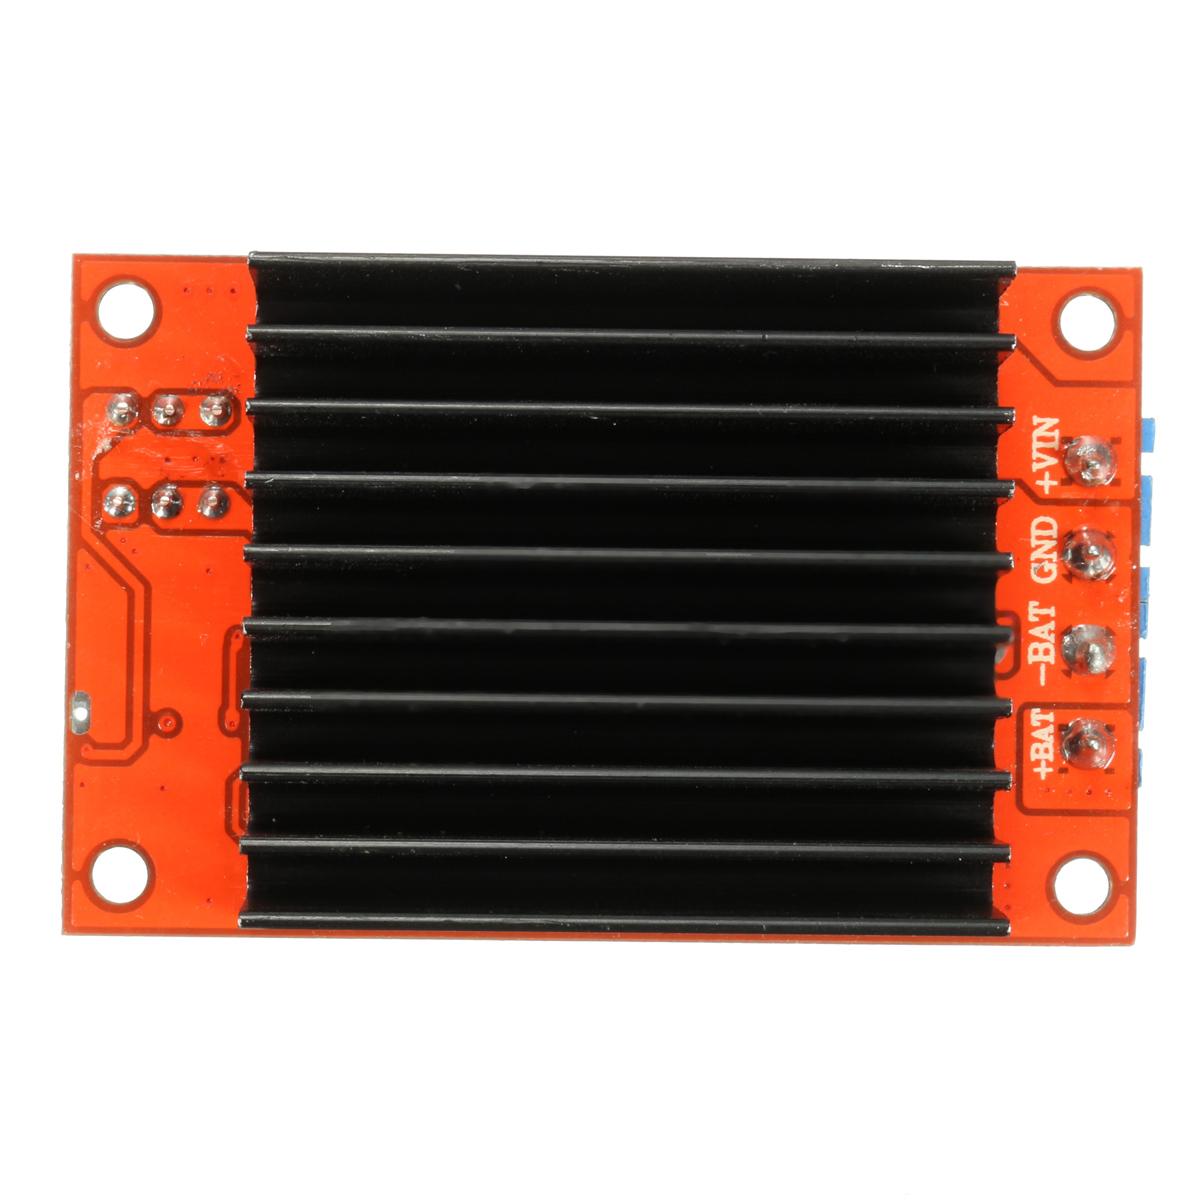 5a Mppt Solar Panel Regulator Controller Battery Charging Module 9v 12v 20a Pwm Charger Alex 3c89eb56 99c0 4a12 B723 202cf66cb10d